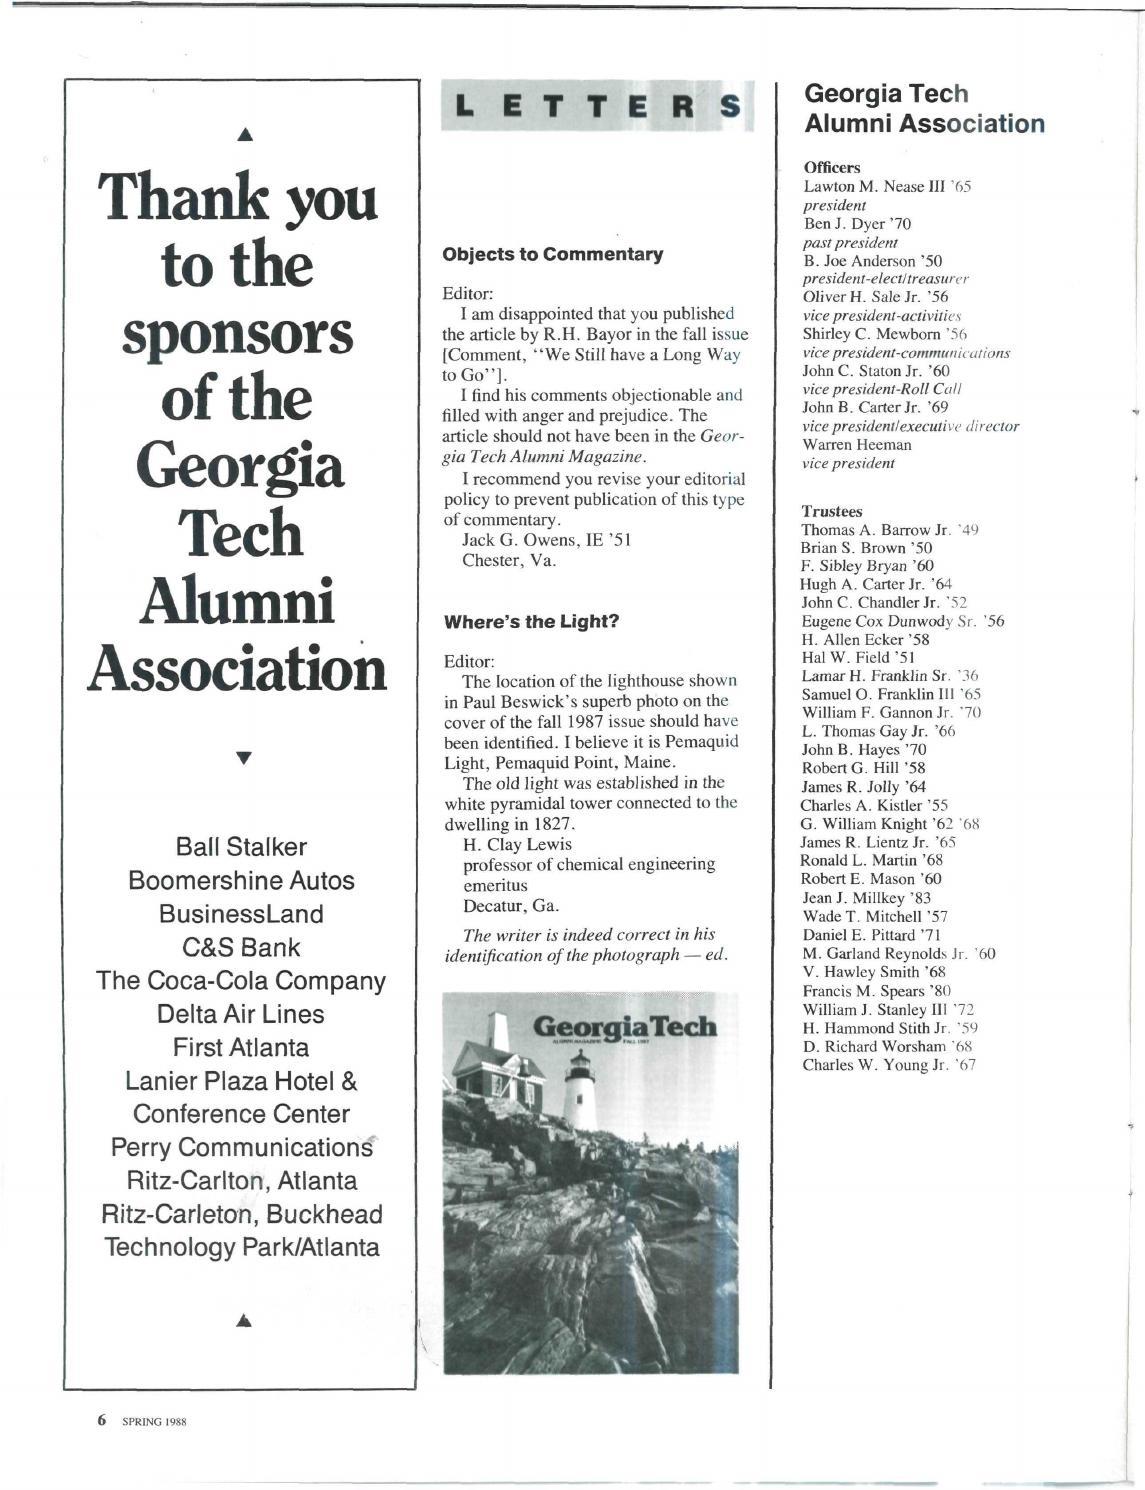 Georgia Tech Alumni Magazine Vol  63, No  02 1988 by Georgia